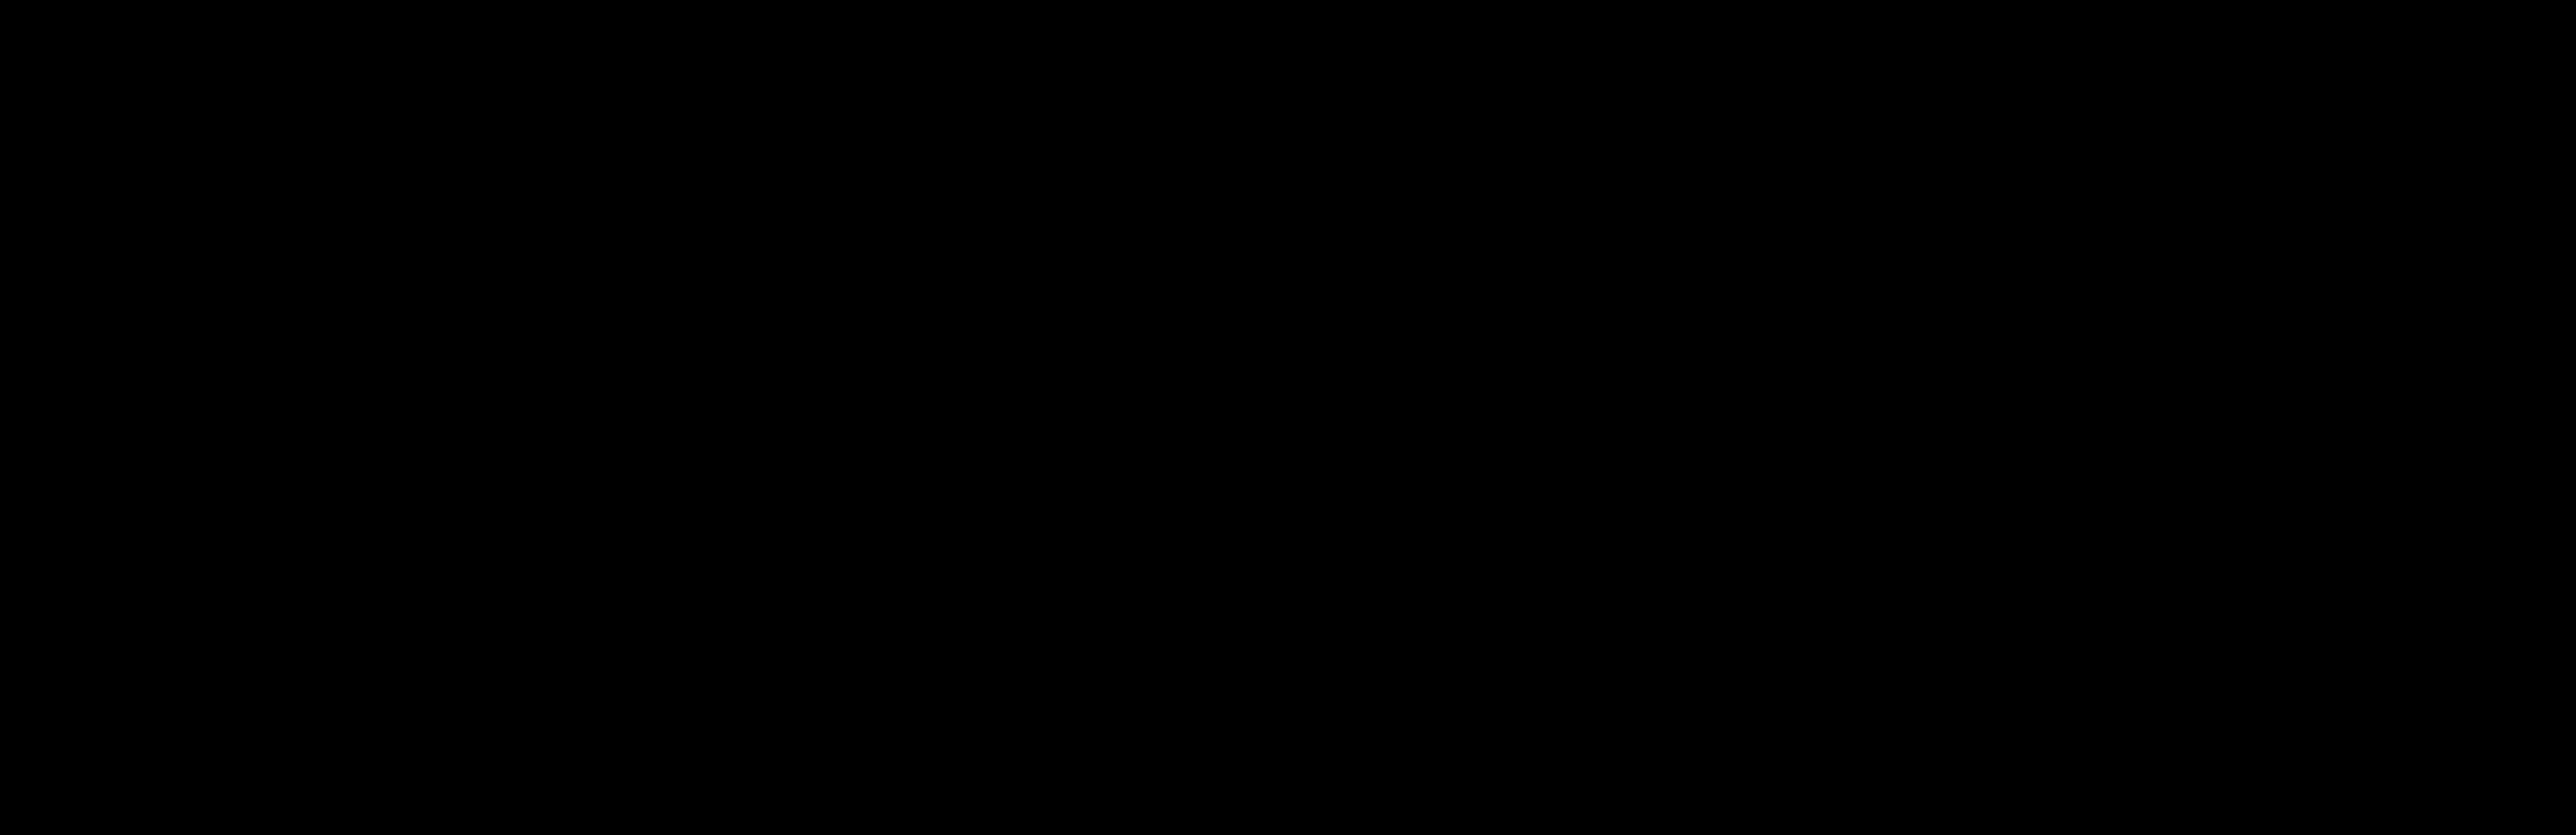 The Elder Scrolls PNG - 171359